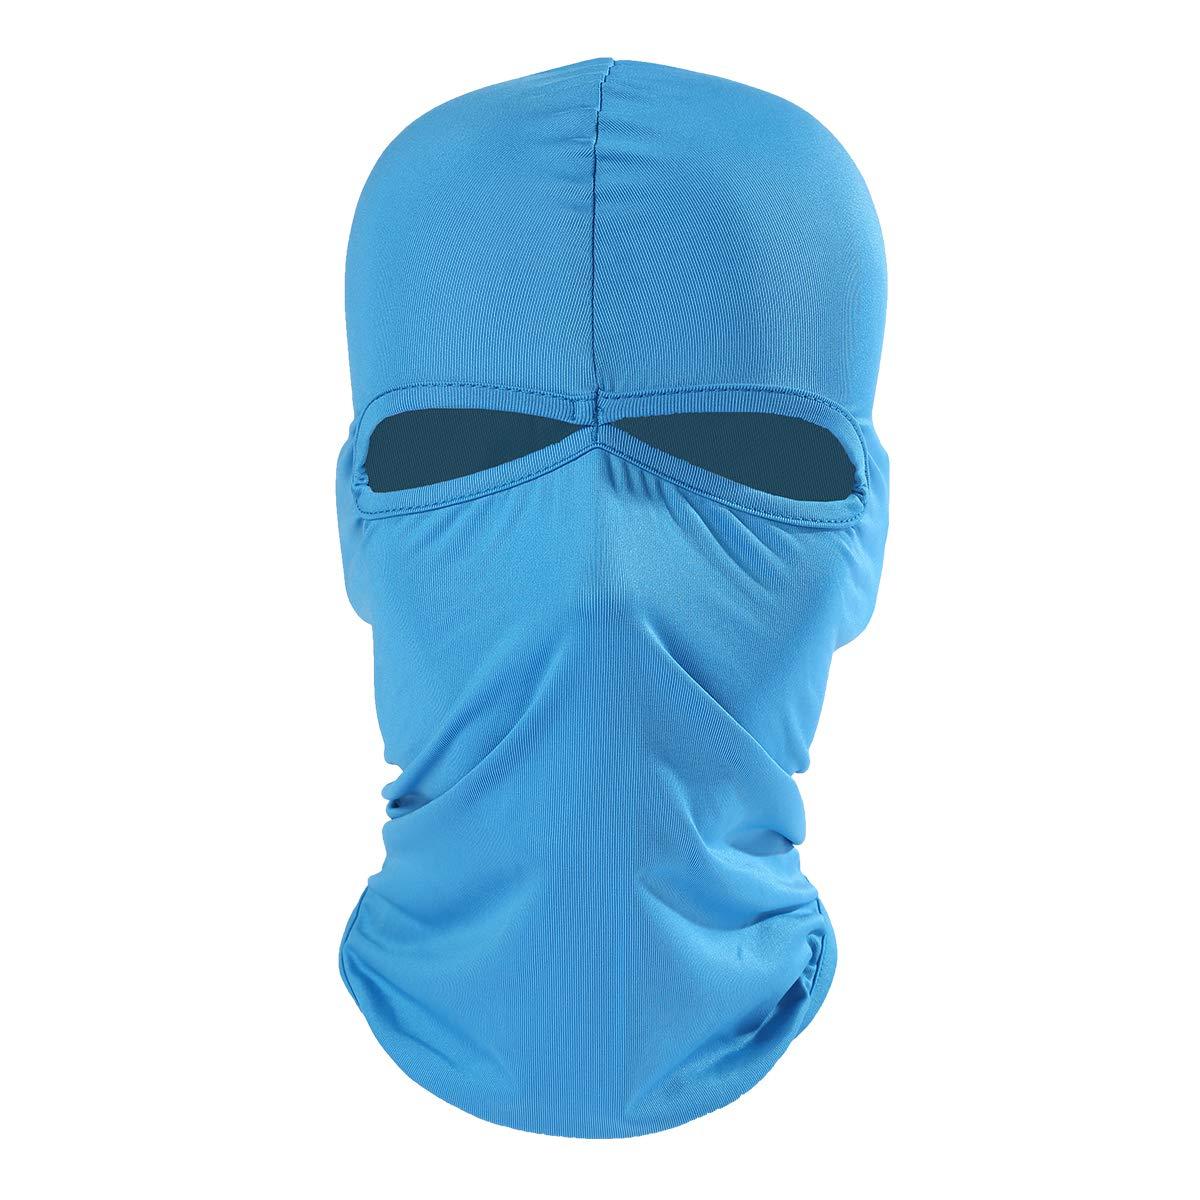 Cozylkx Balaclava Ski Mask Windproof Quick Dry Full Face Mask UV Protection TM 14142